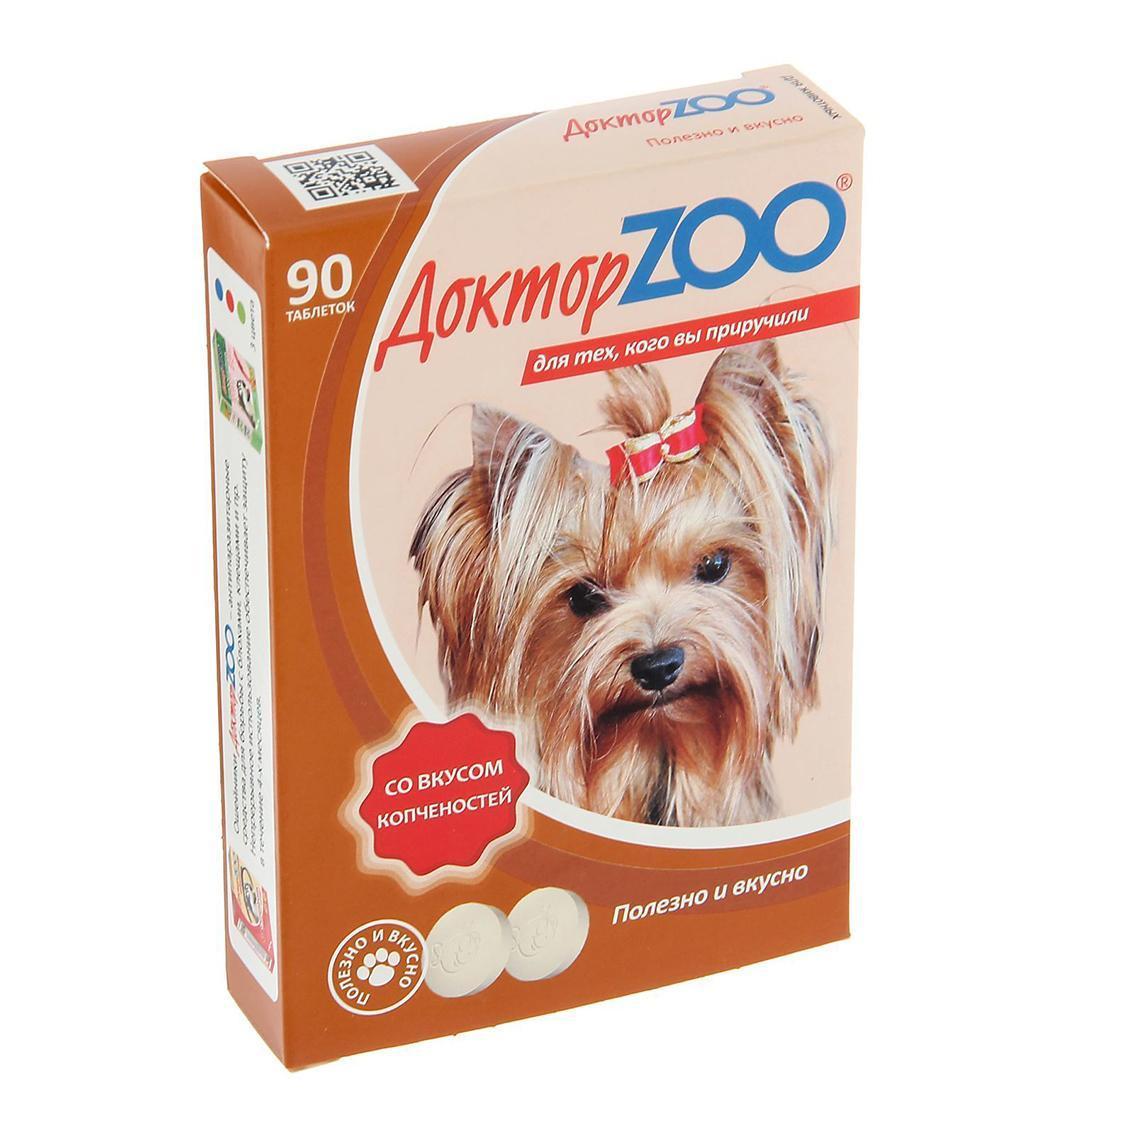 Витамины Доктор ZOO для собак, со вкусом копченостей